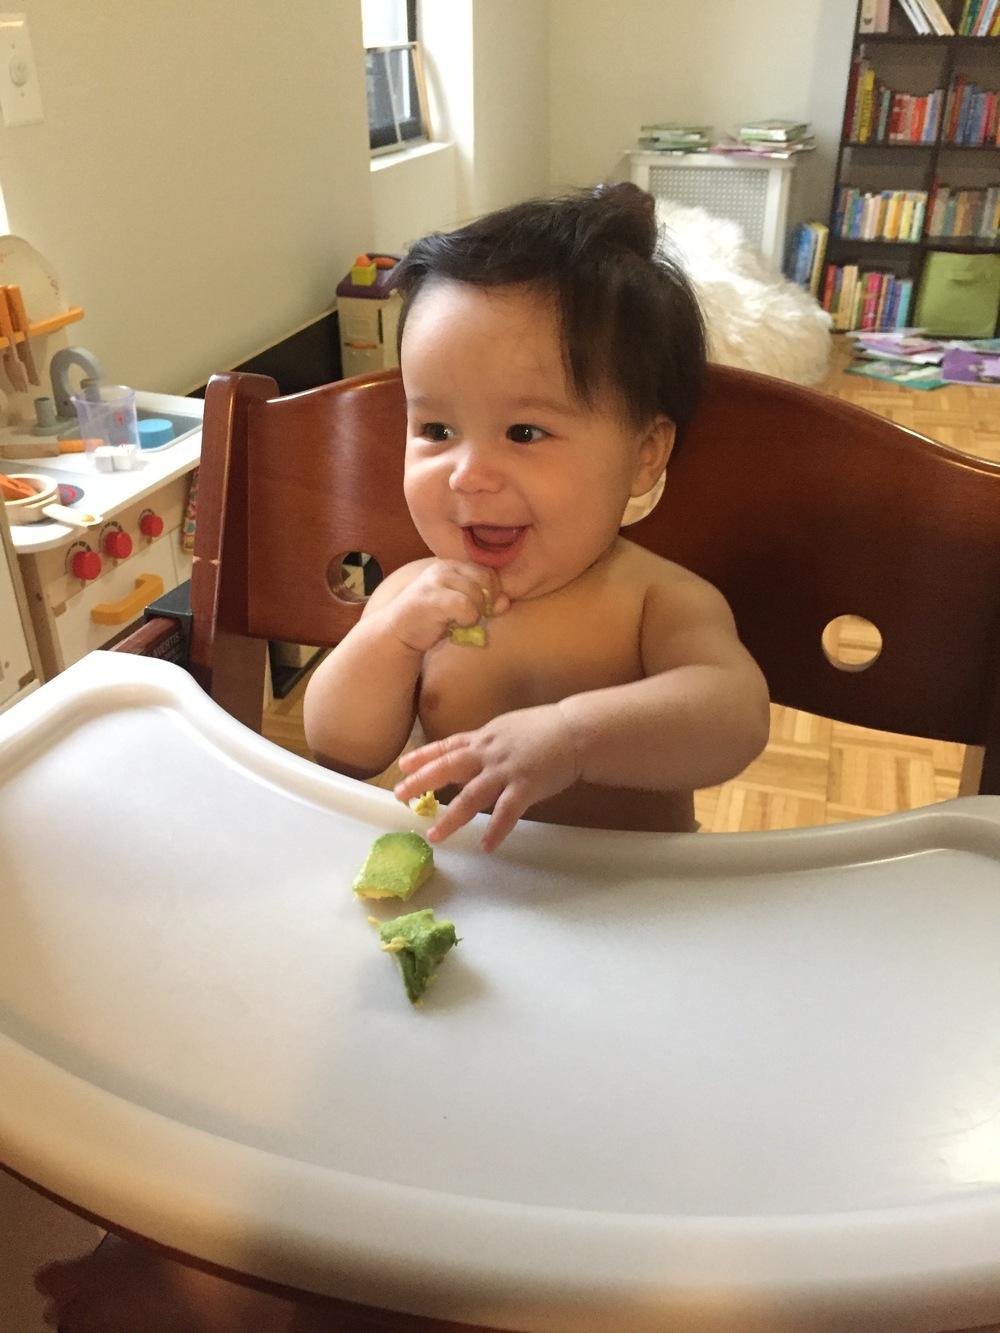 Trying avocado!